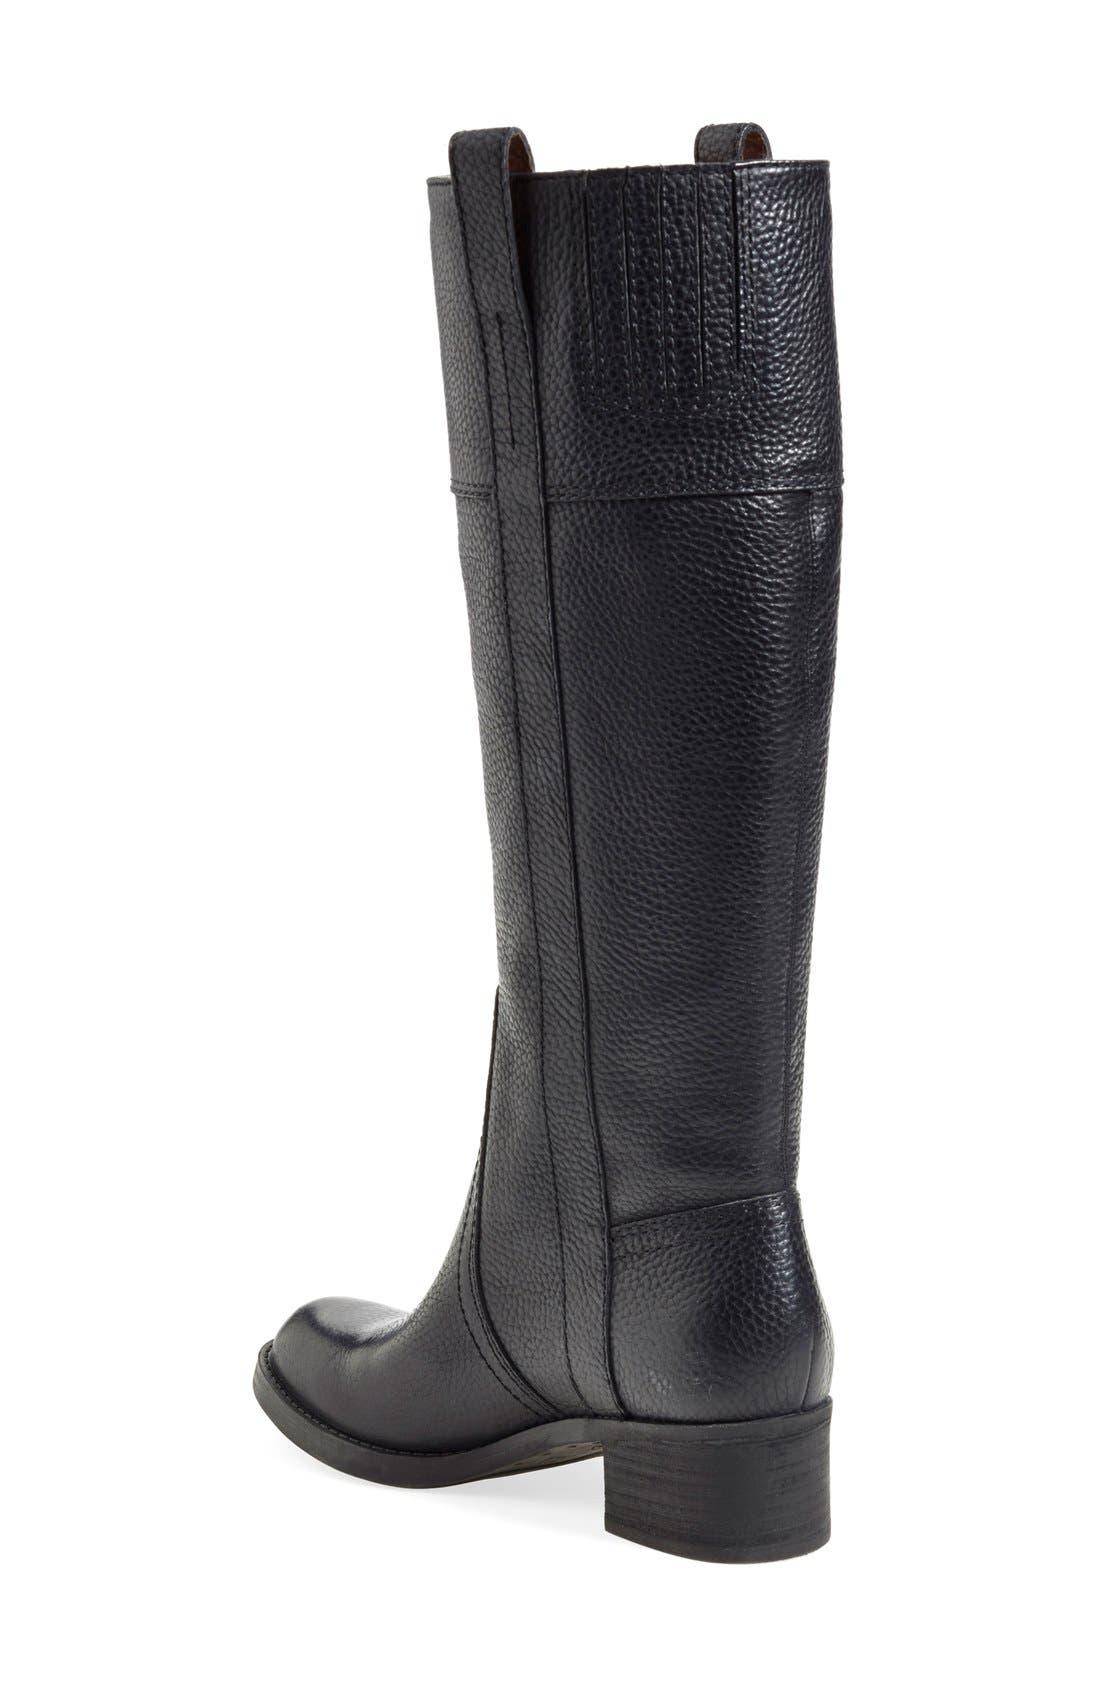 Alternate Image 2  - Lucky Brand 'Heloisse' Boot (Wide Calf) (Women)